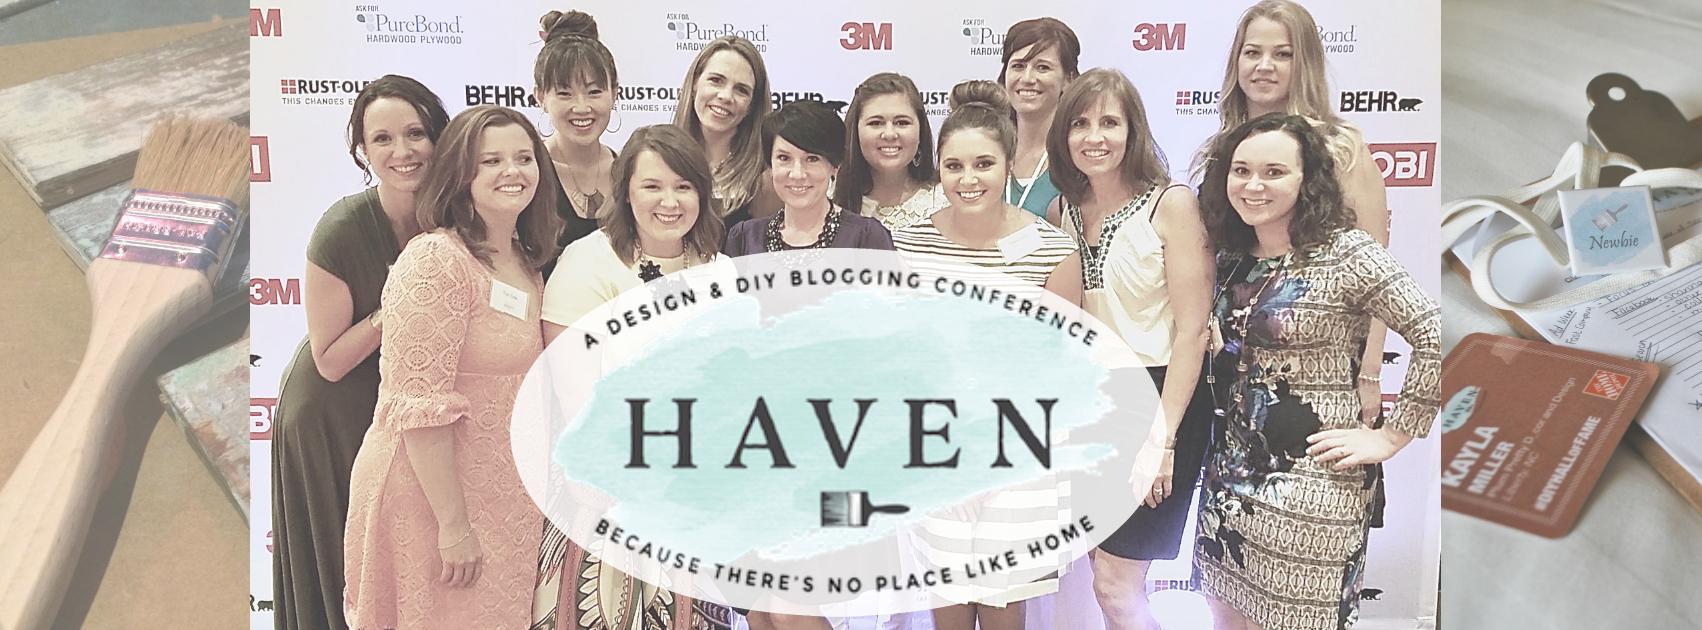 Plum Pretty Decor and Design at The Haven Conference